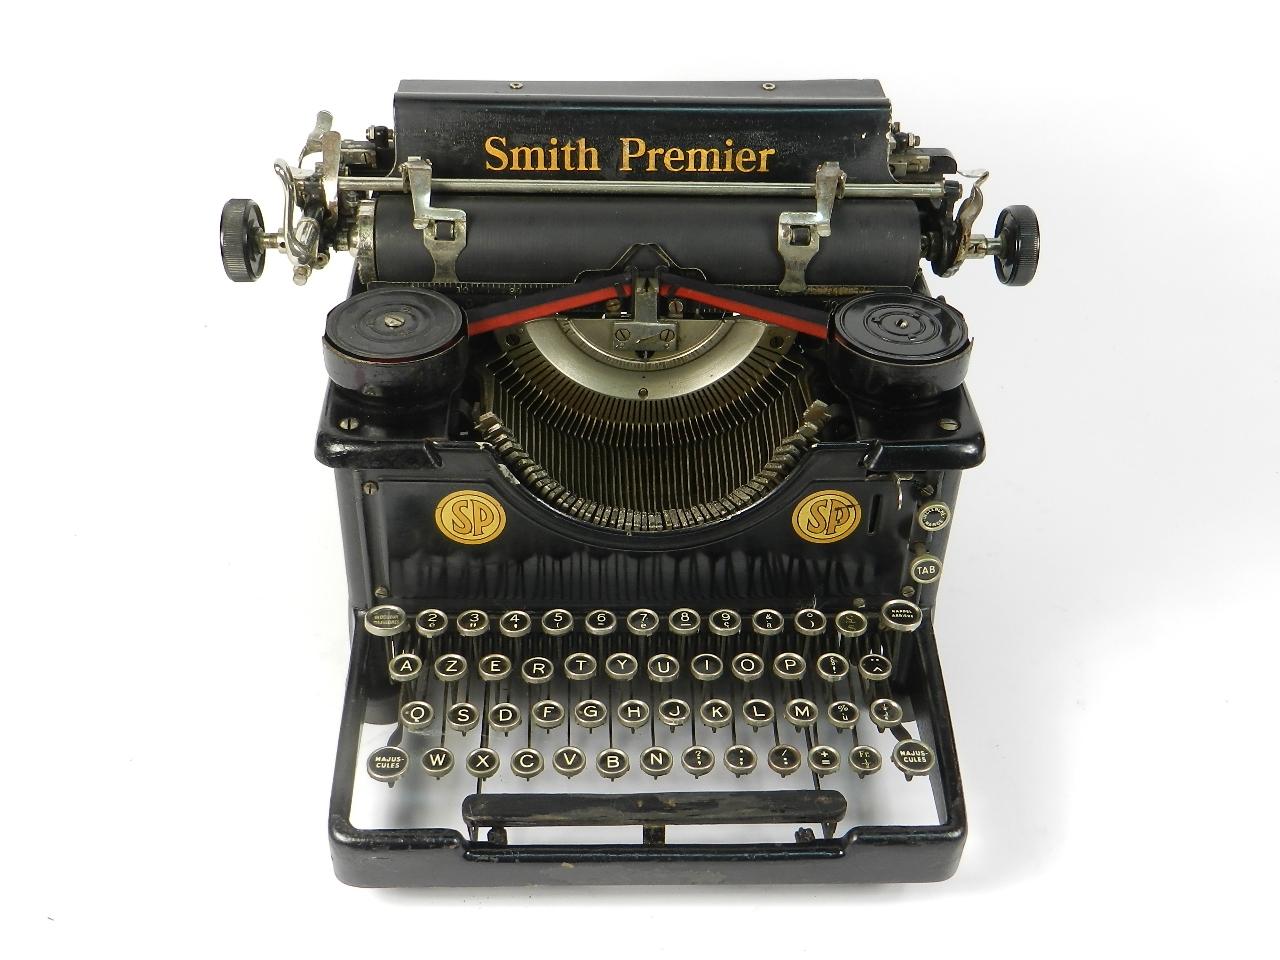 Imagen SMITH PREMIER Mod 50 AÑO 1923 31201